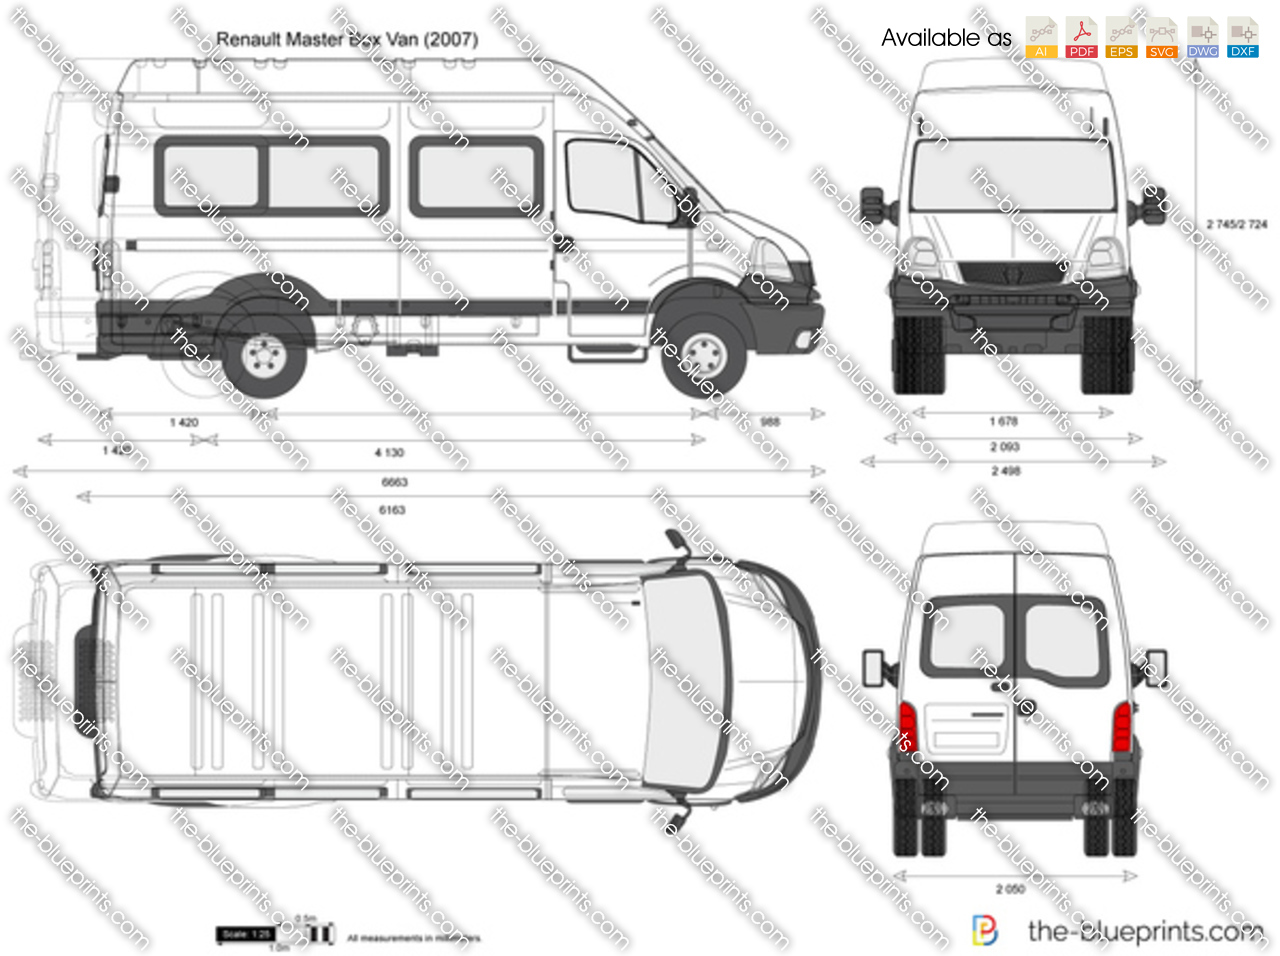 Renault Master Box Van 2008